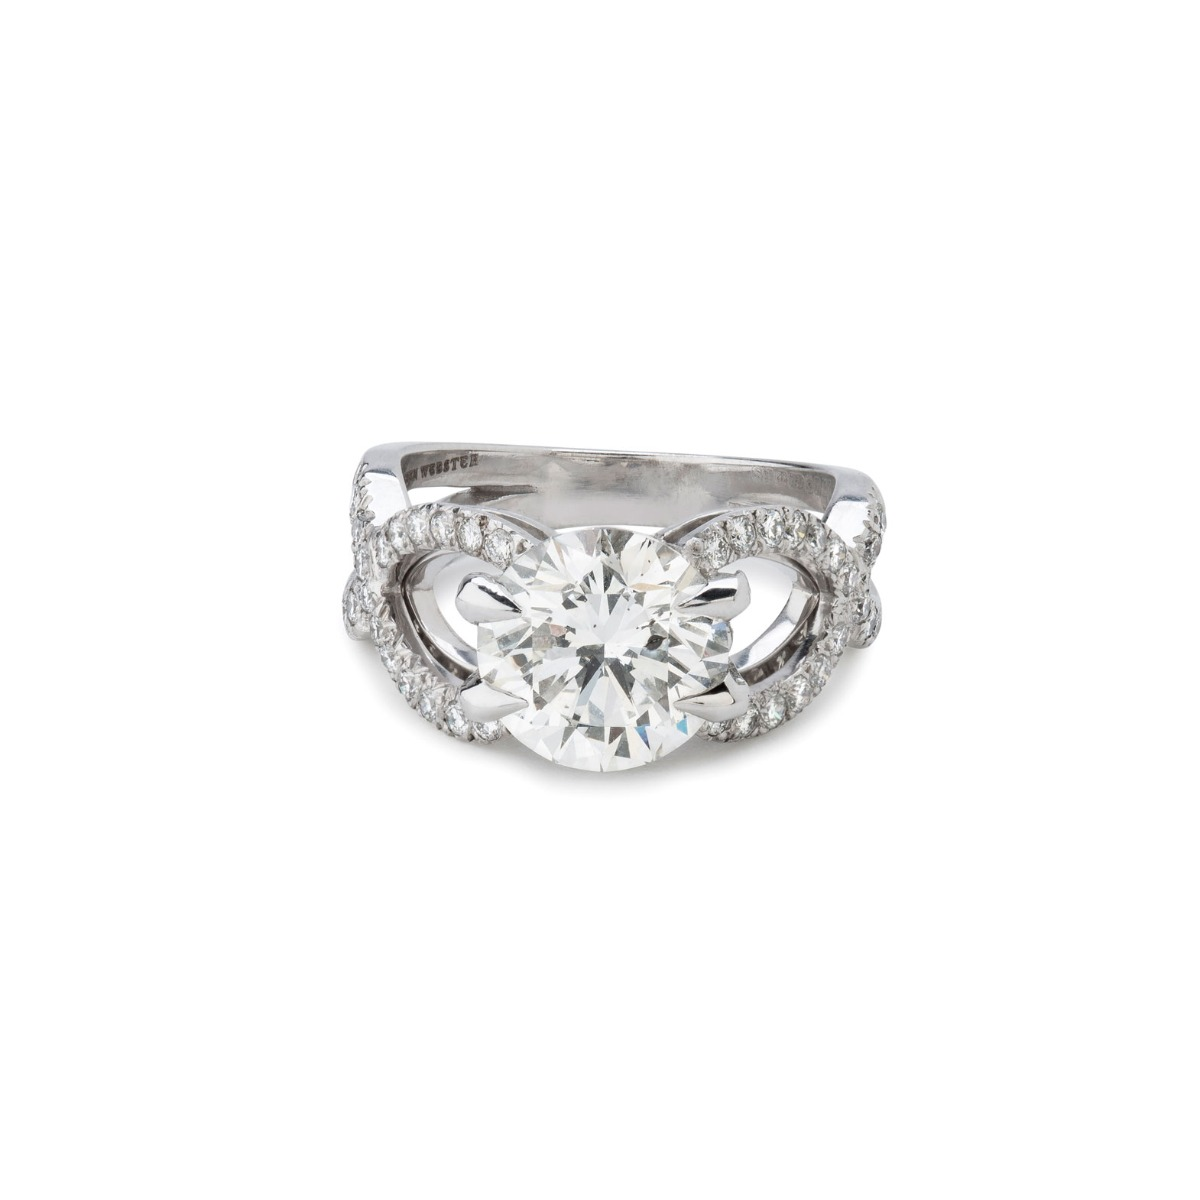 Forget me knot diamond engagement ring, Stephen Webster (Photo credit: Stephen Webster)